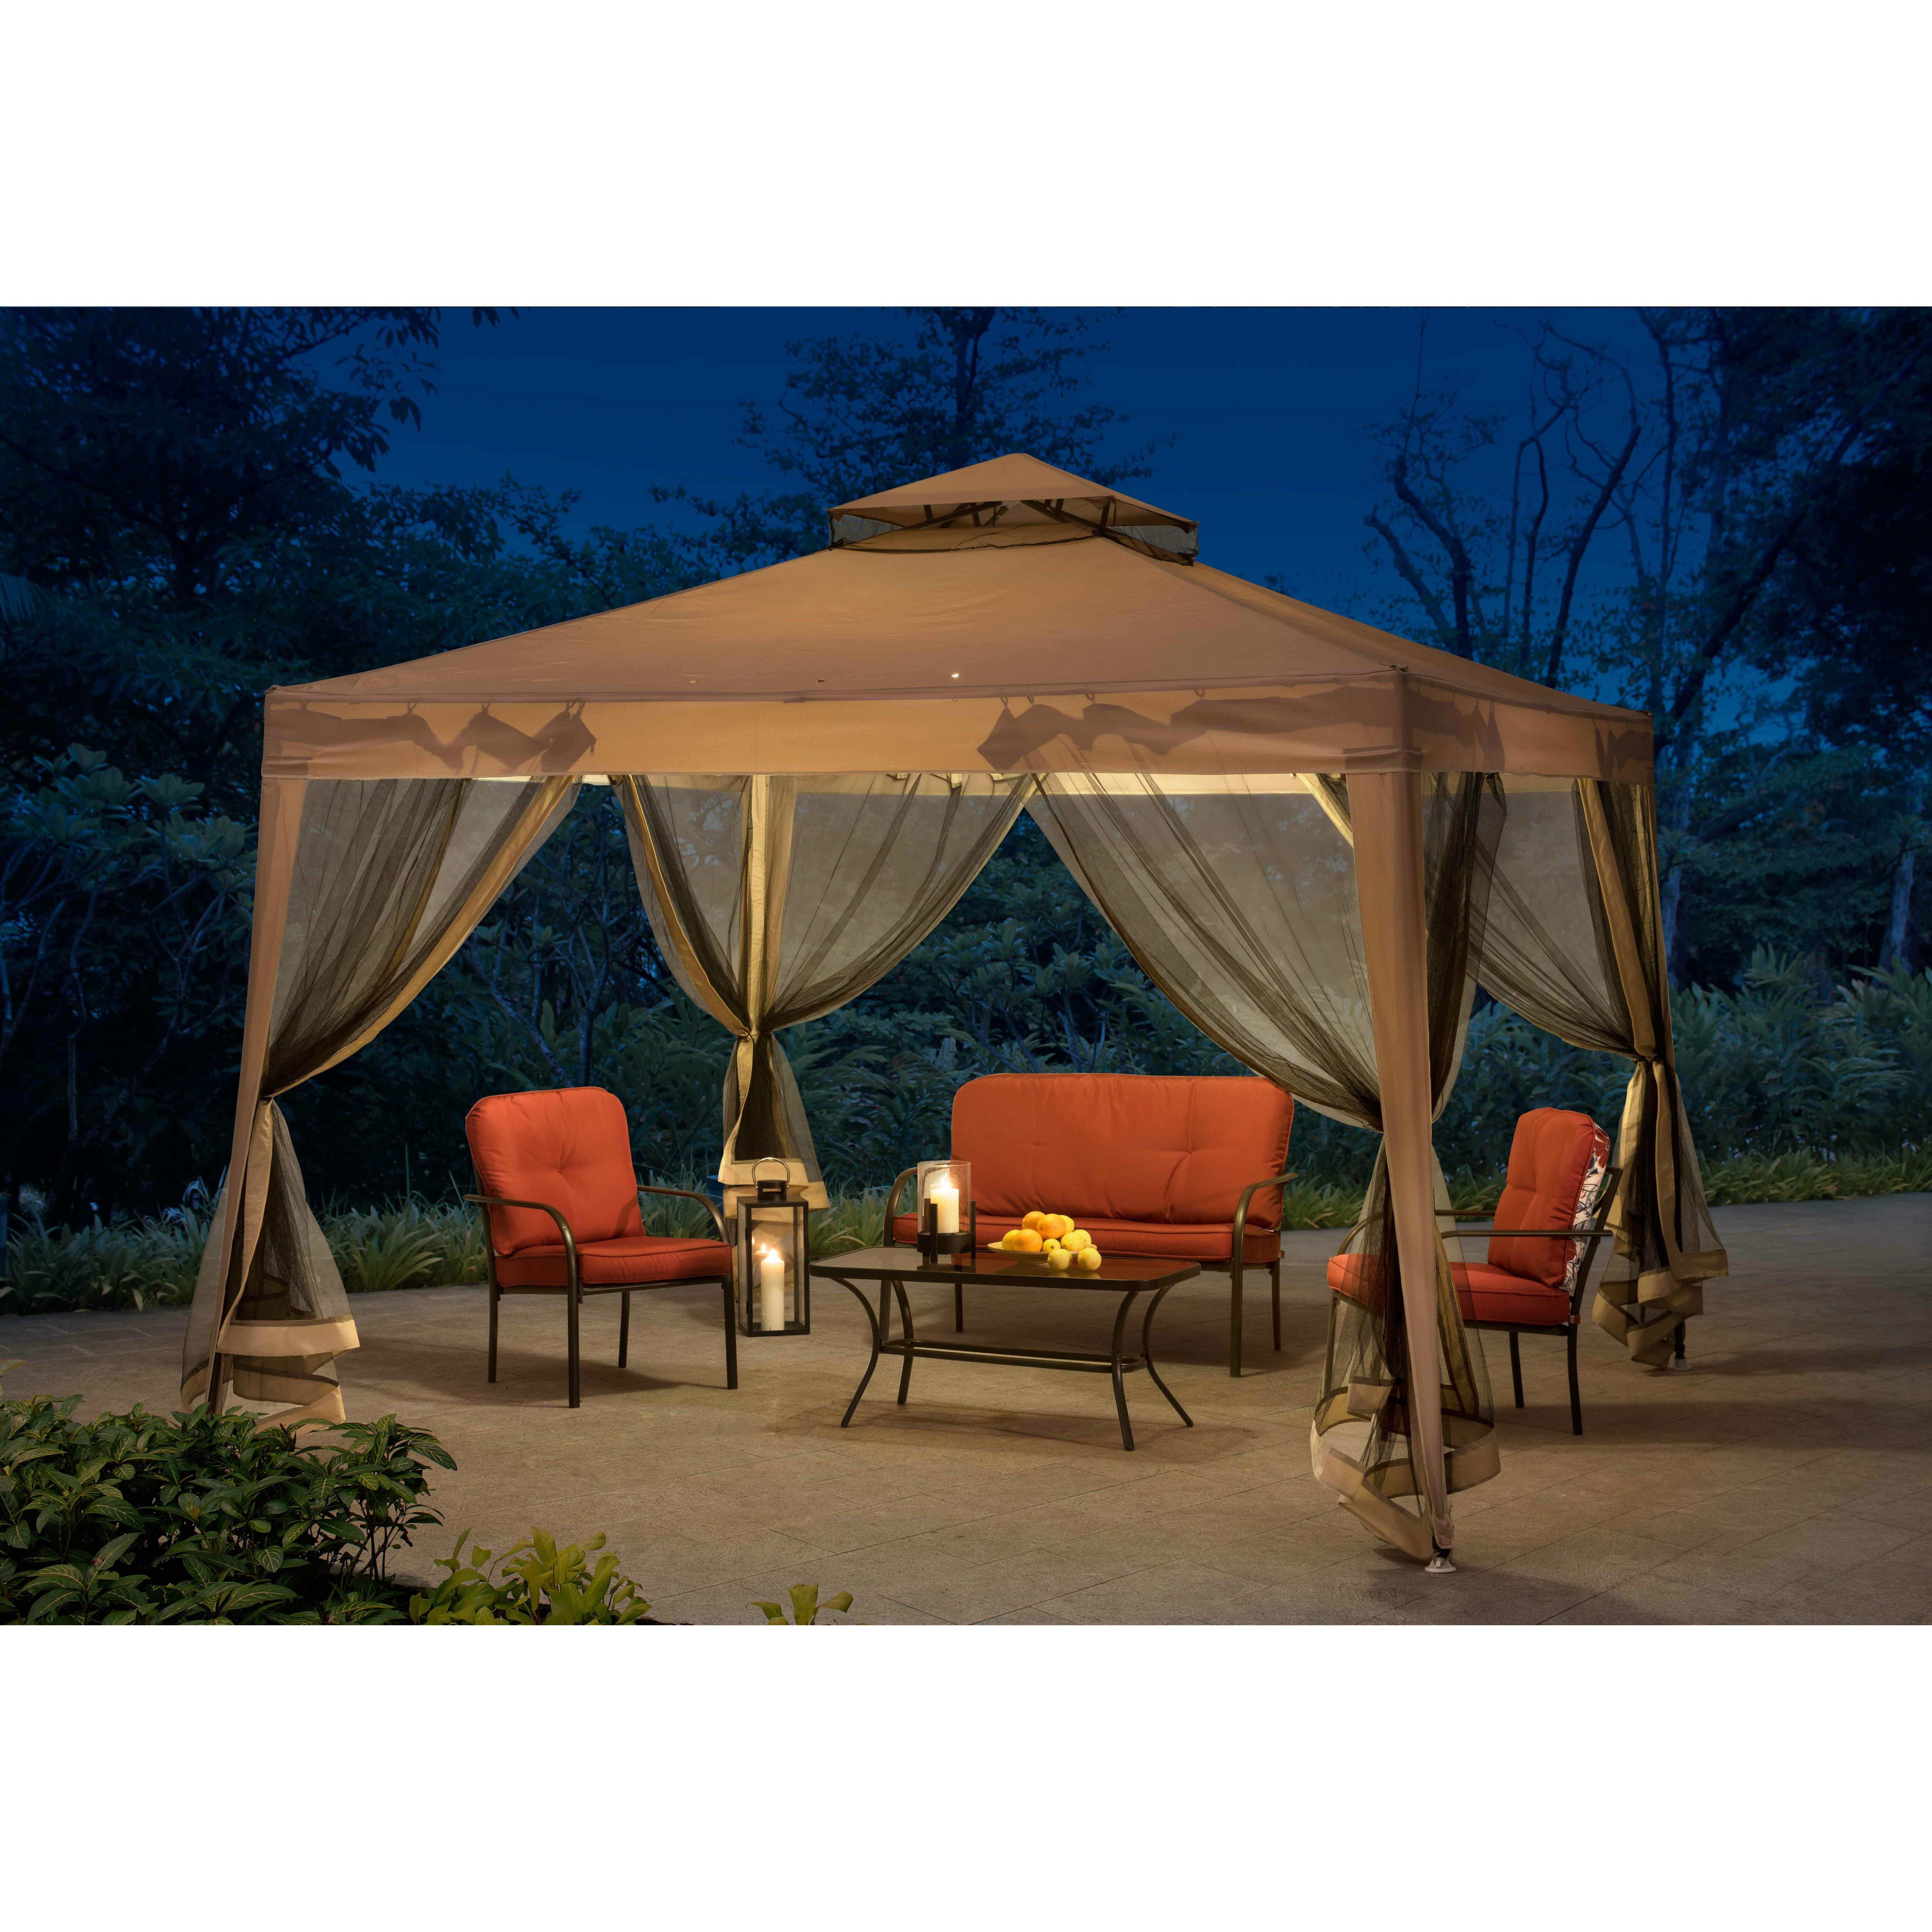 10 Ft 10 Ft Canopy : Sunjoy catania ft w d metal portable gazebo